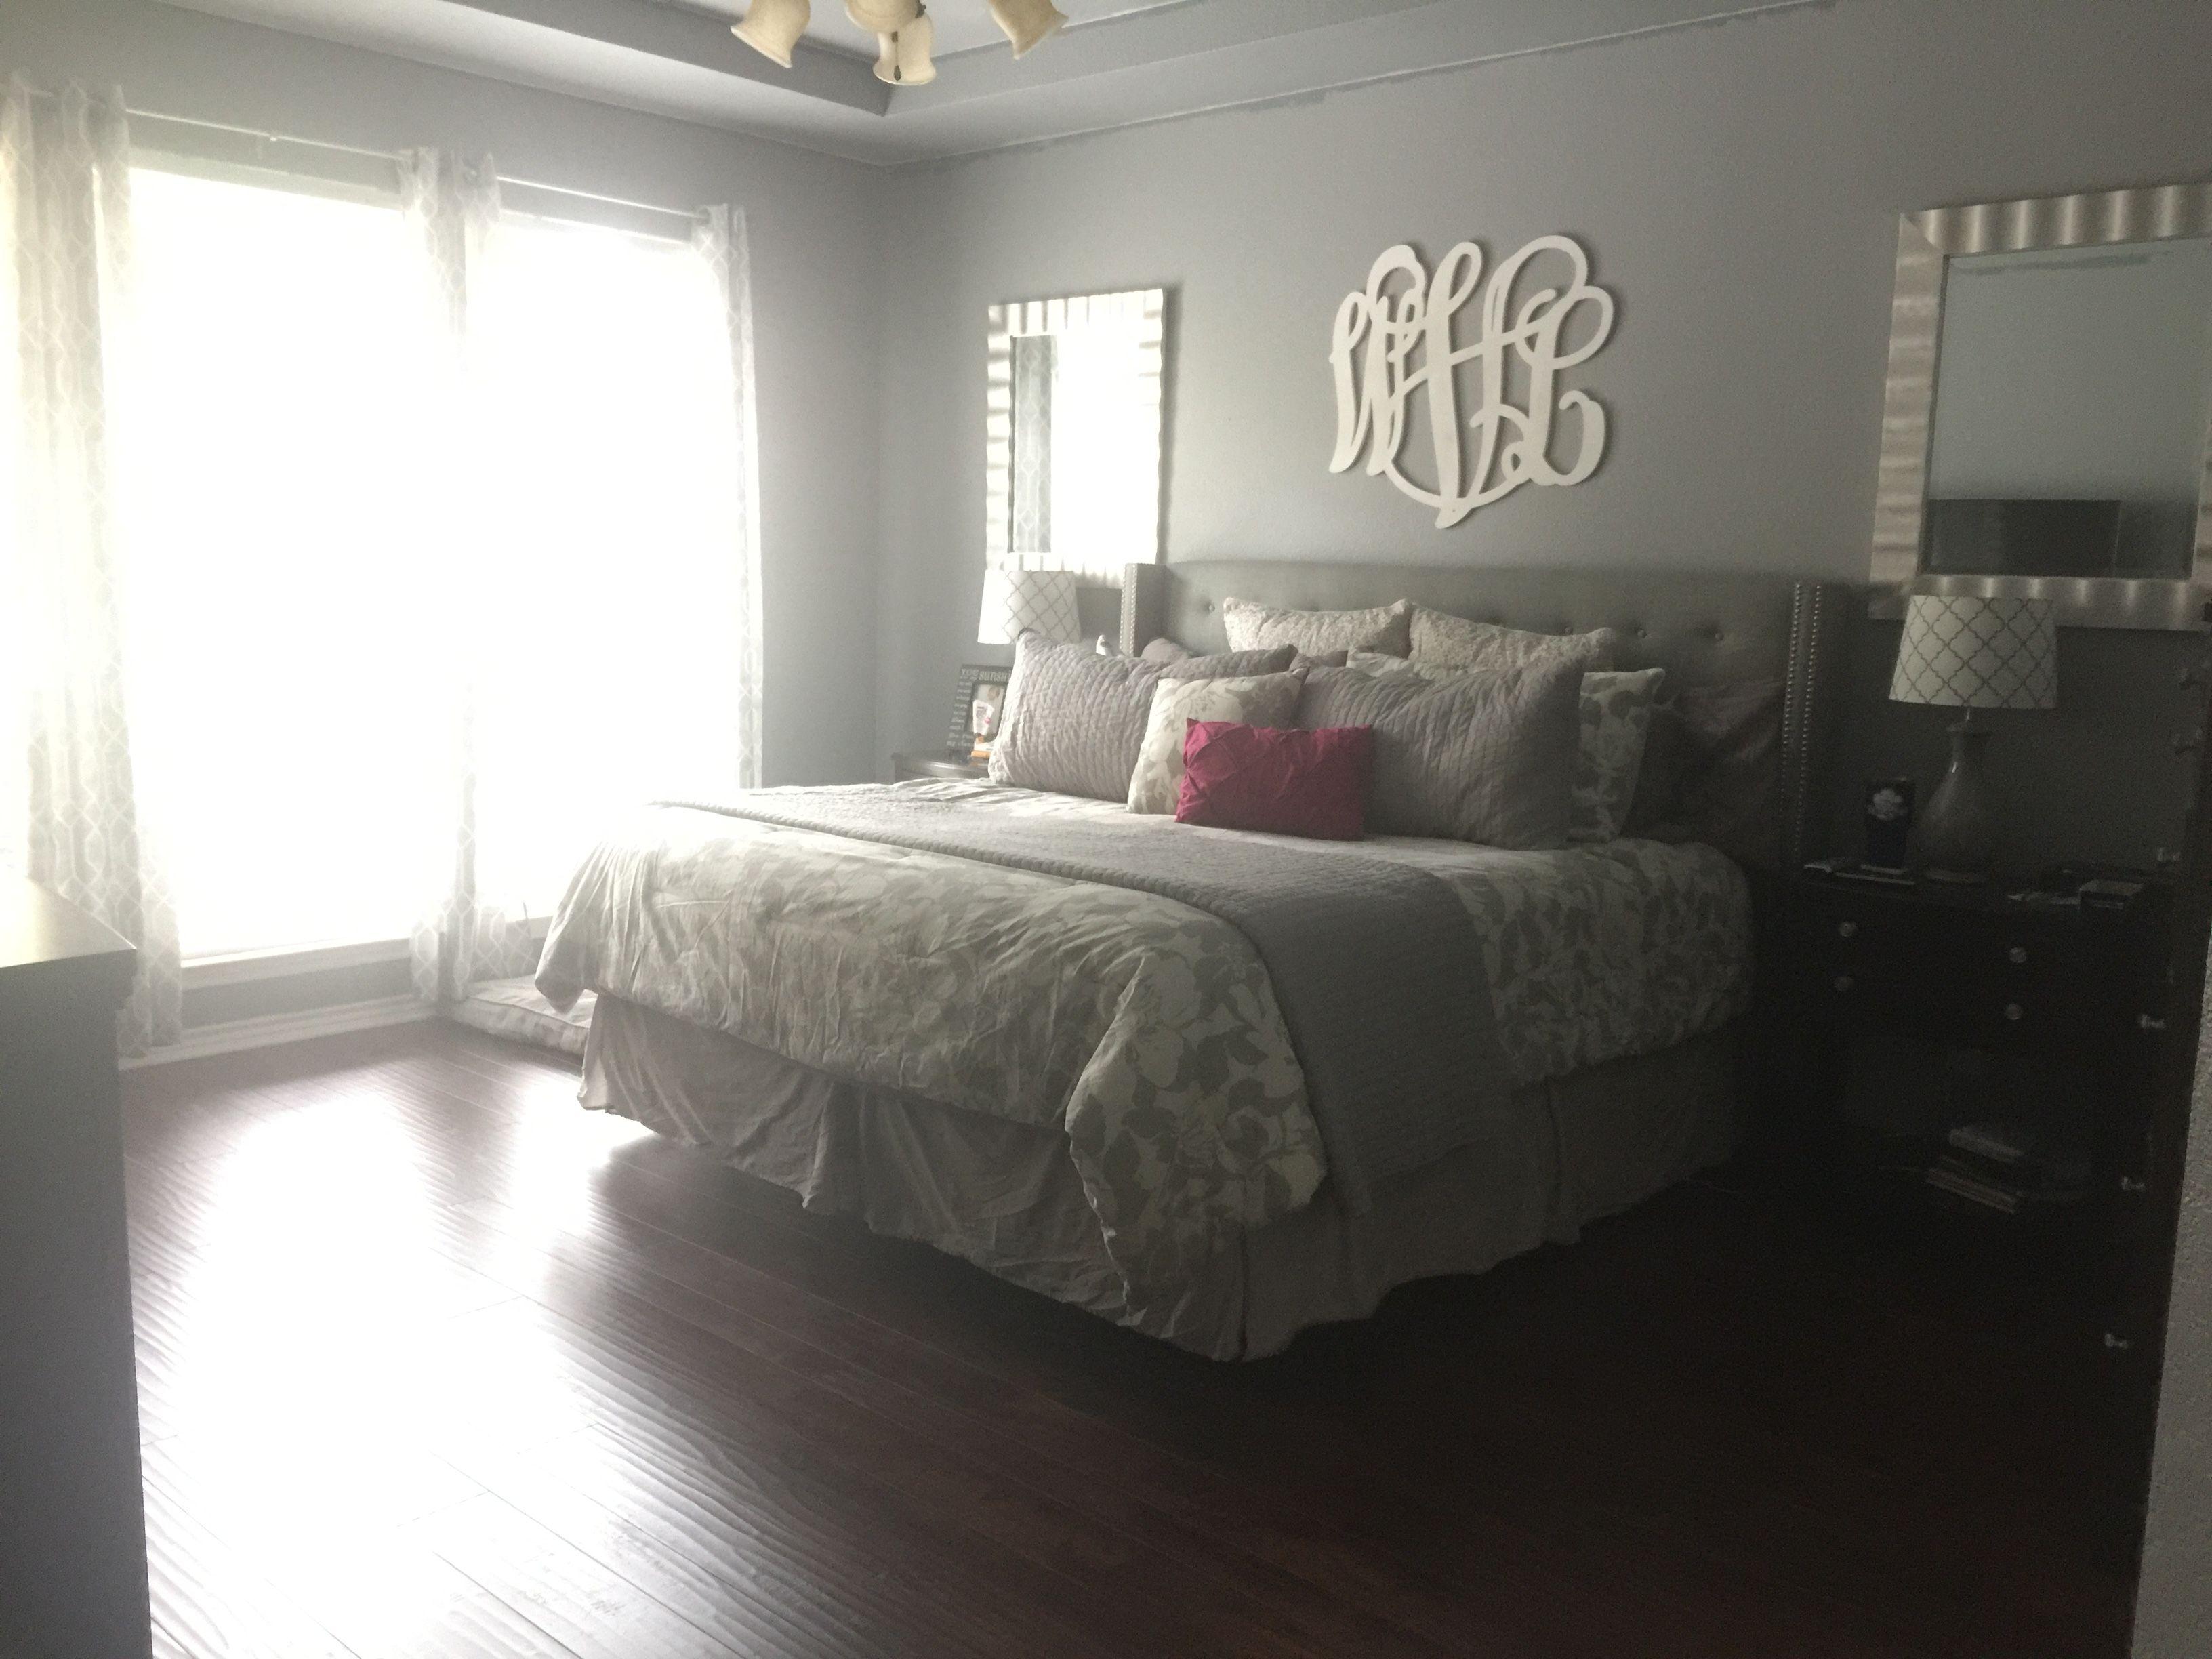 Gray master bedroom hardwood floors monogram above bed - Master bedroom art above bed ...